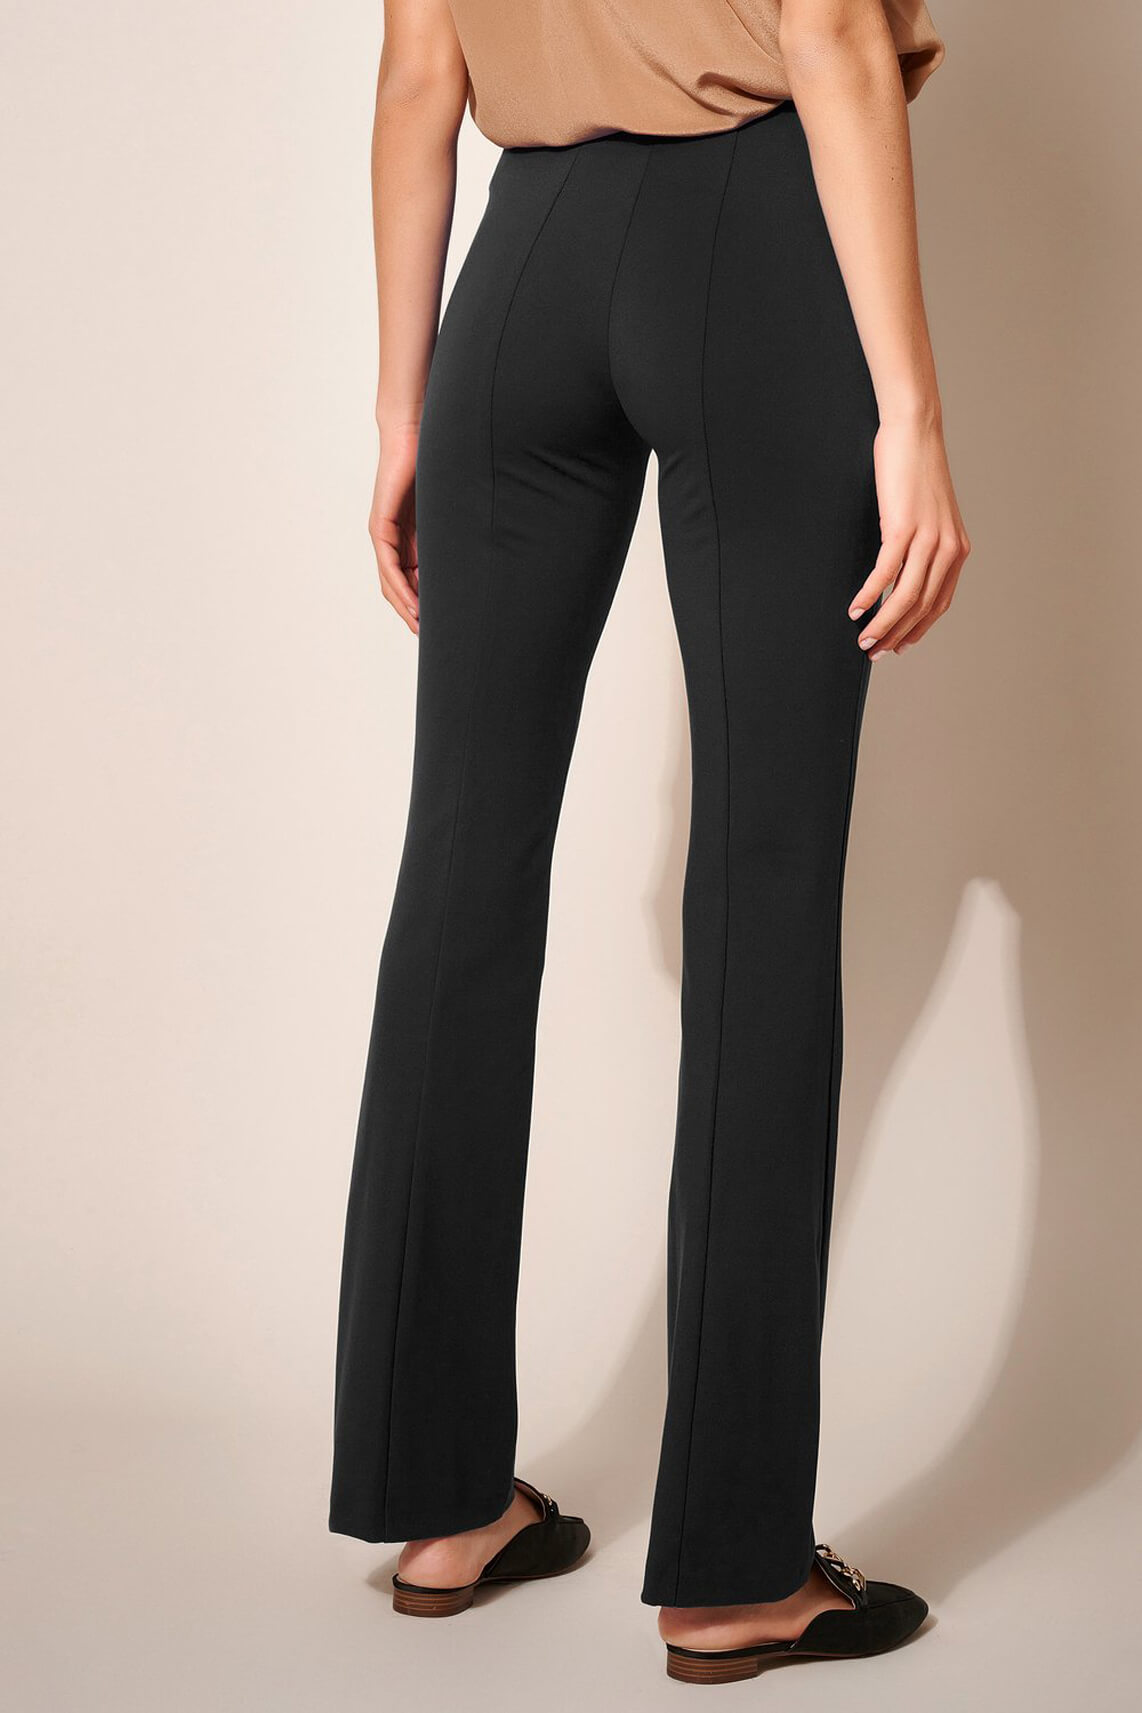 Rosner Dames L32 Alisa flared pantalon Zwart